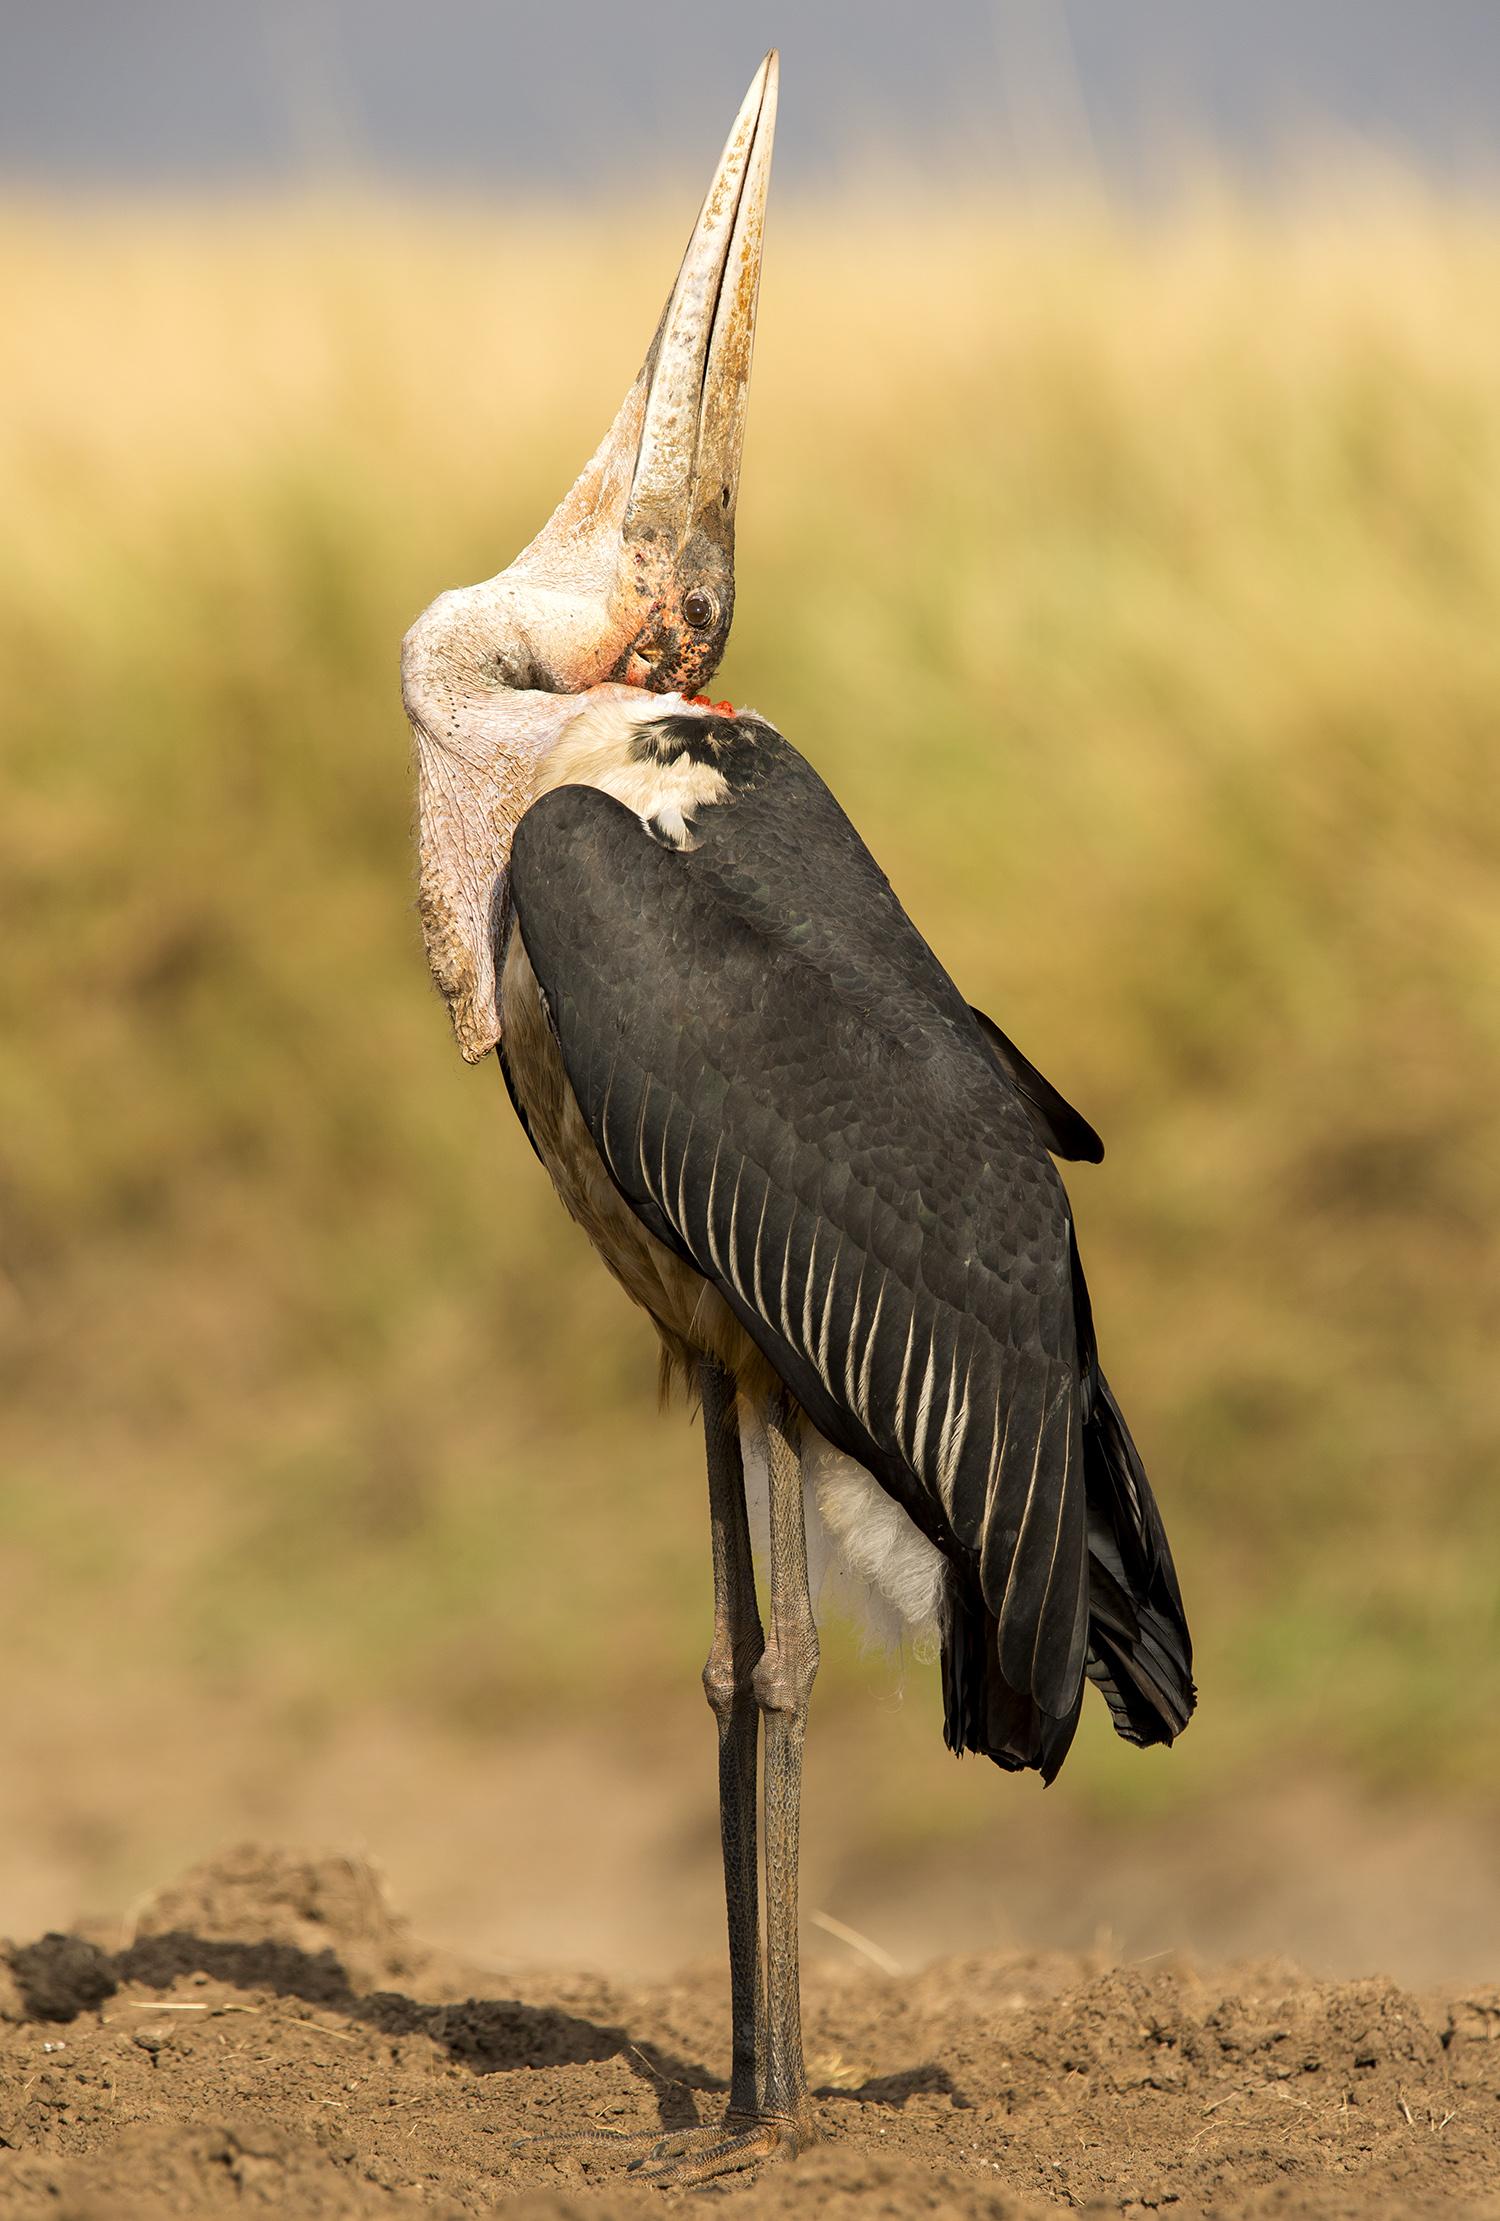 Marabou stork and neck